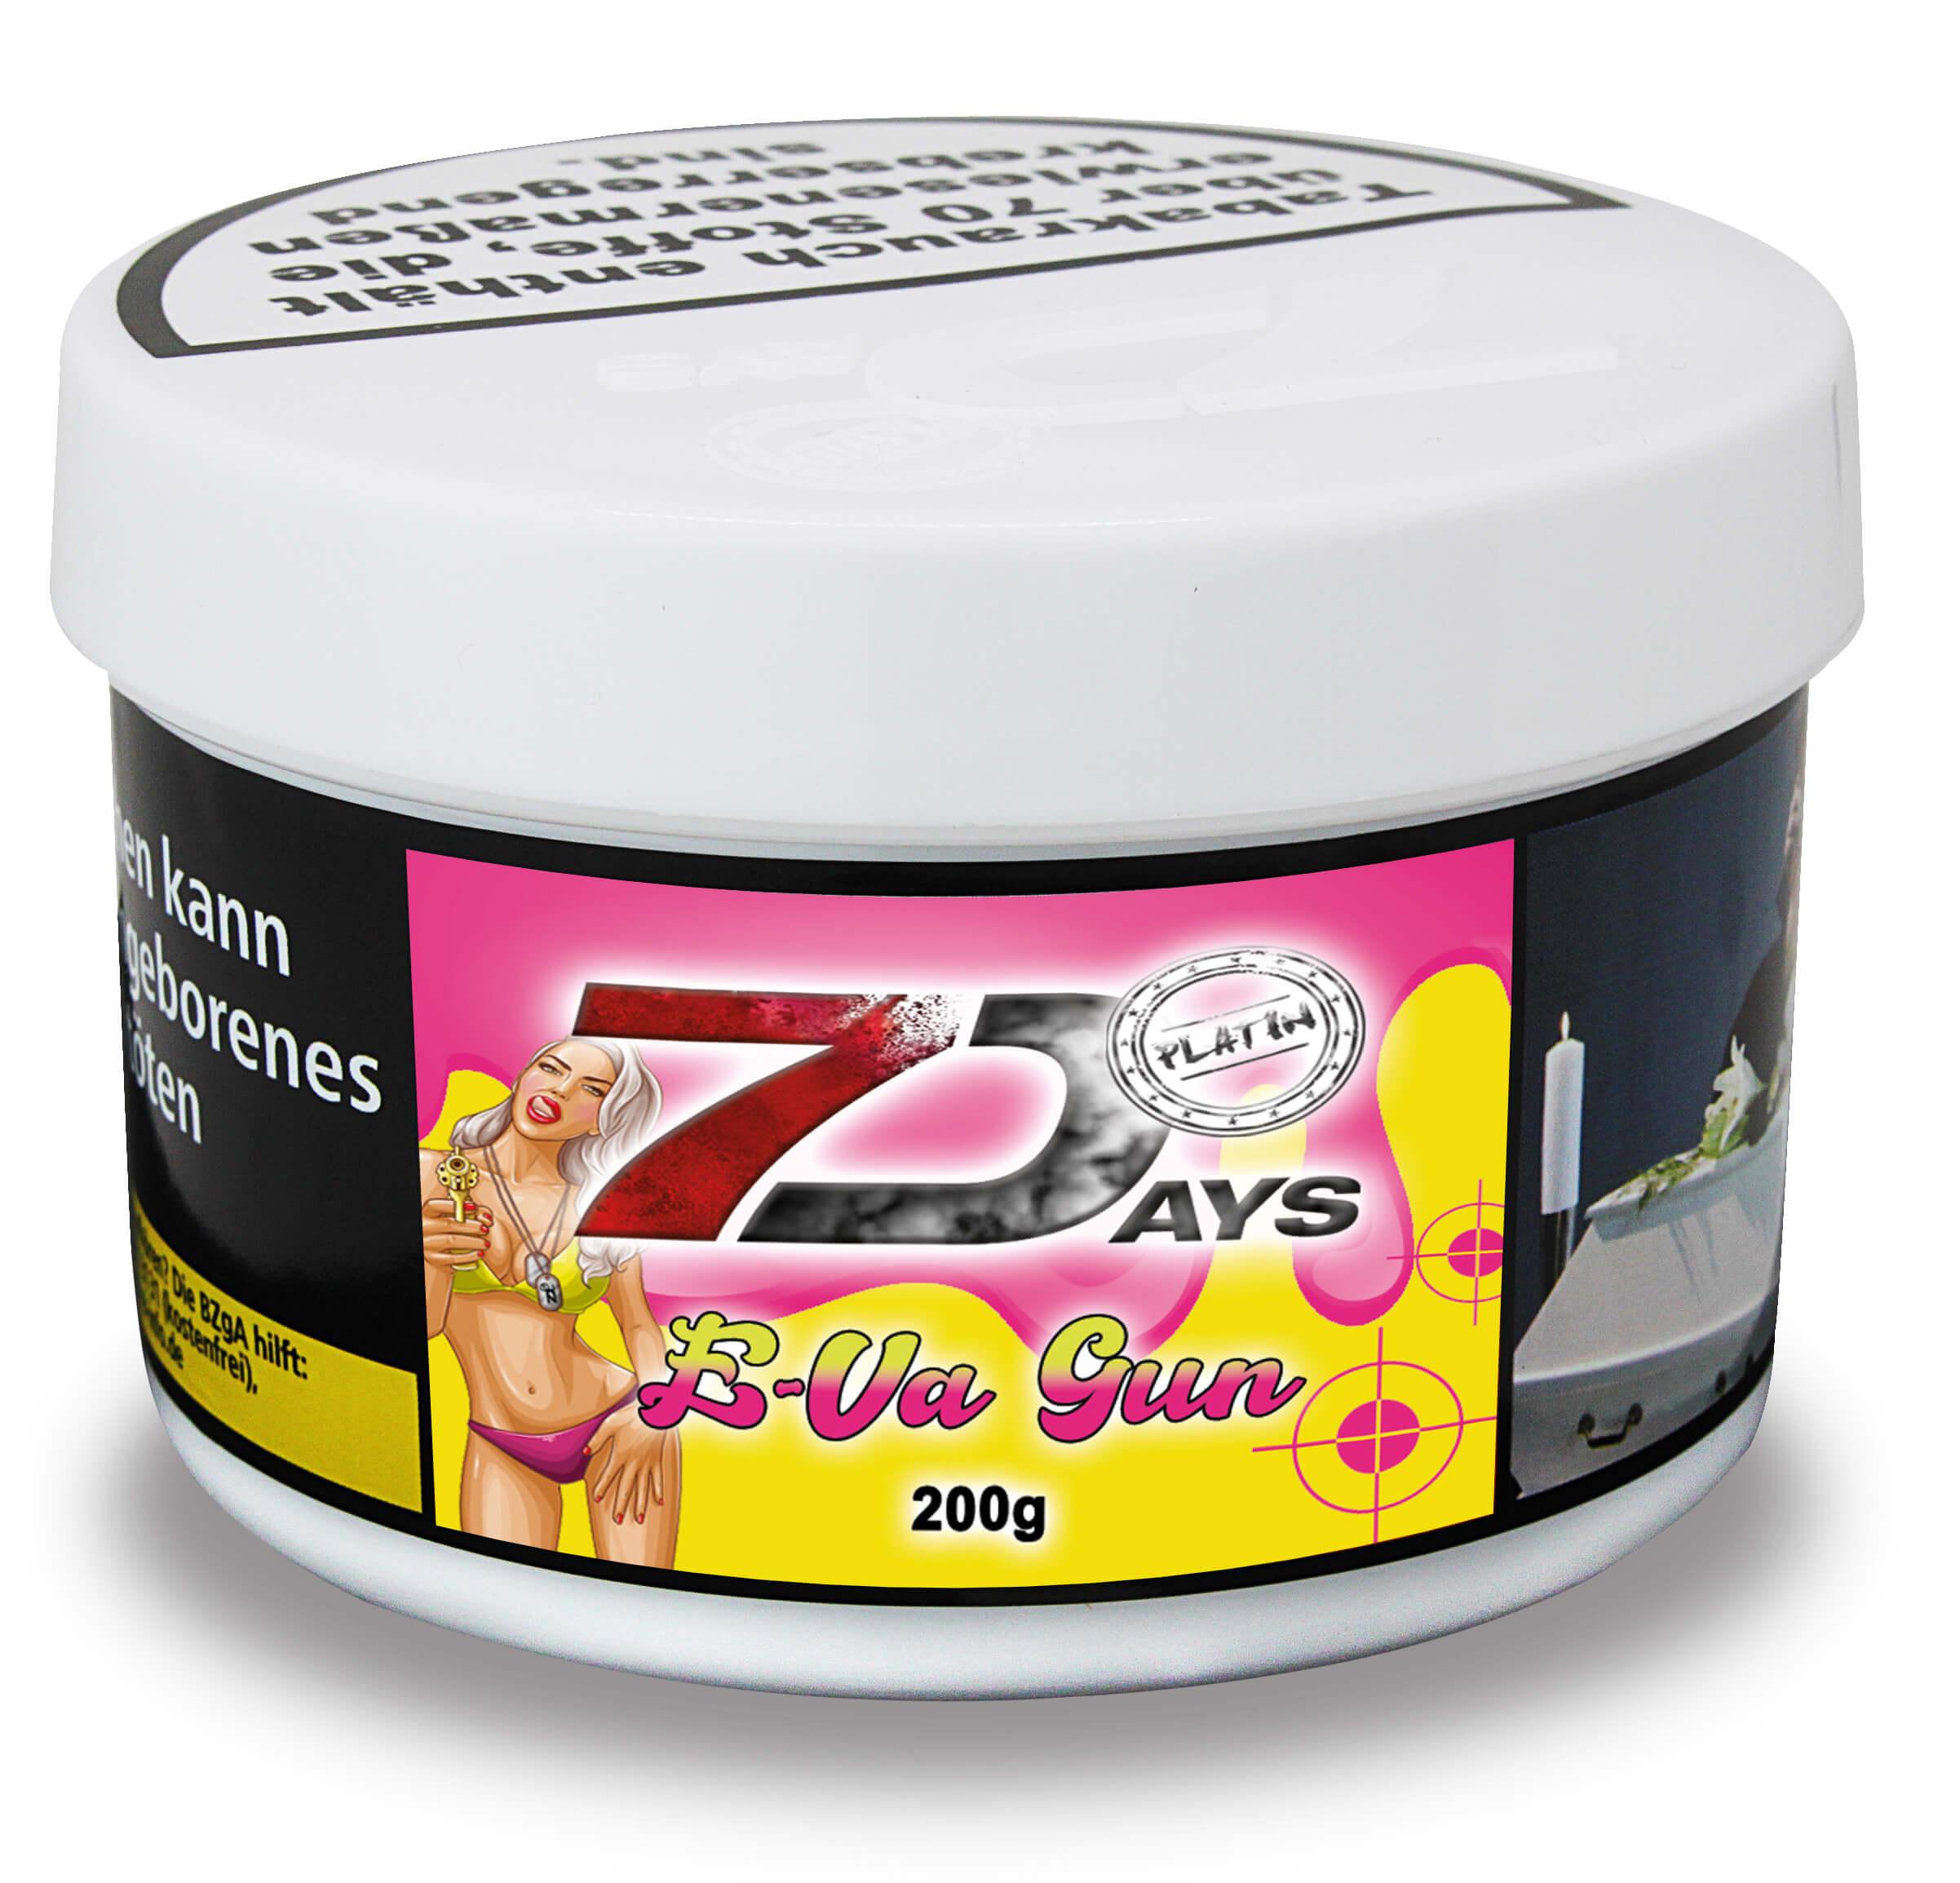 7 Days Platin Tabak - E-Va Gun 200g